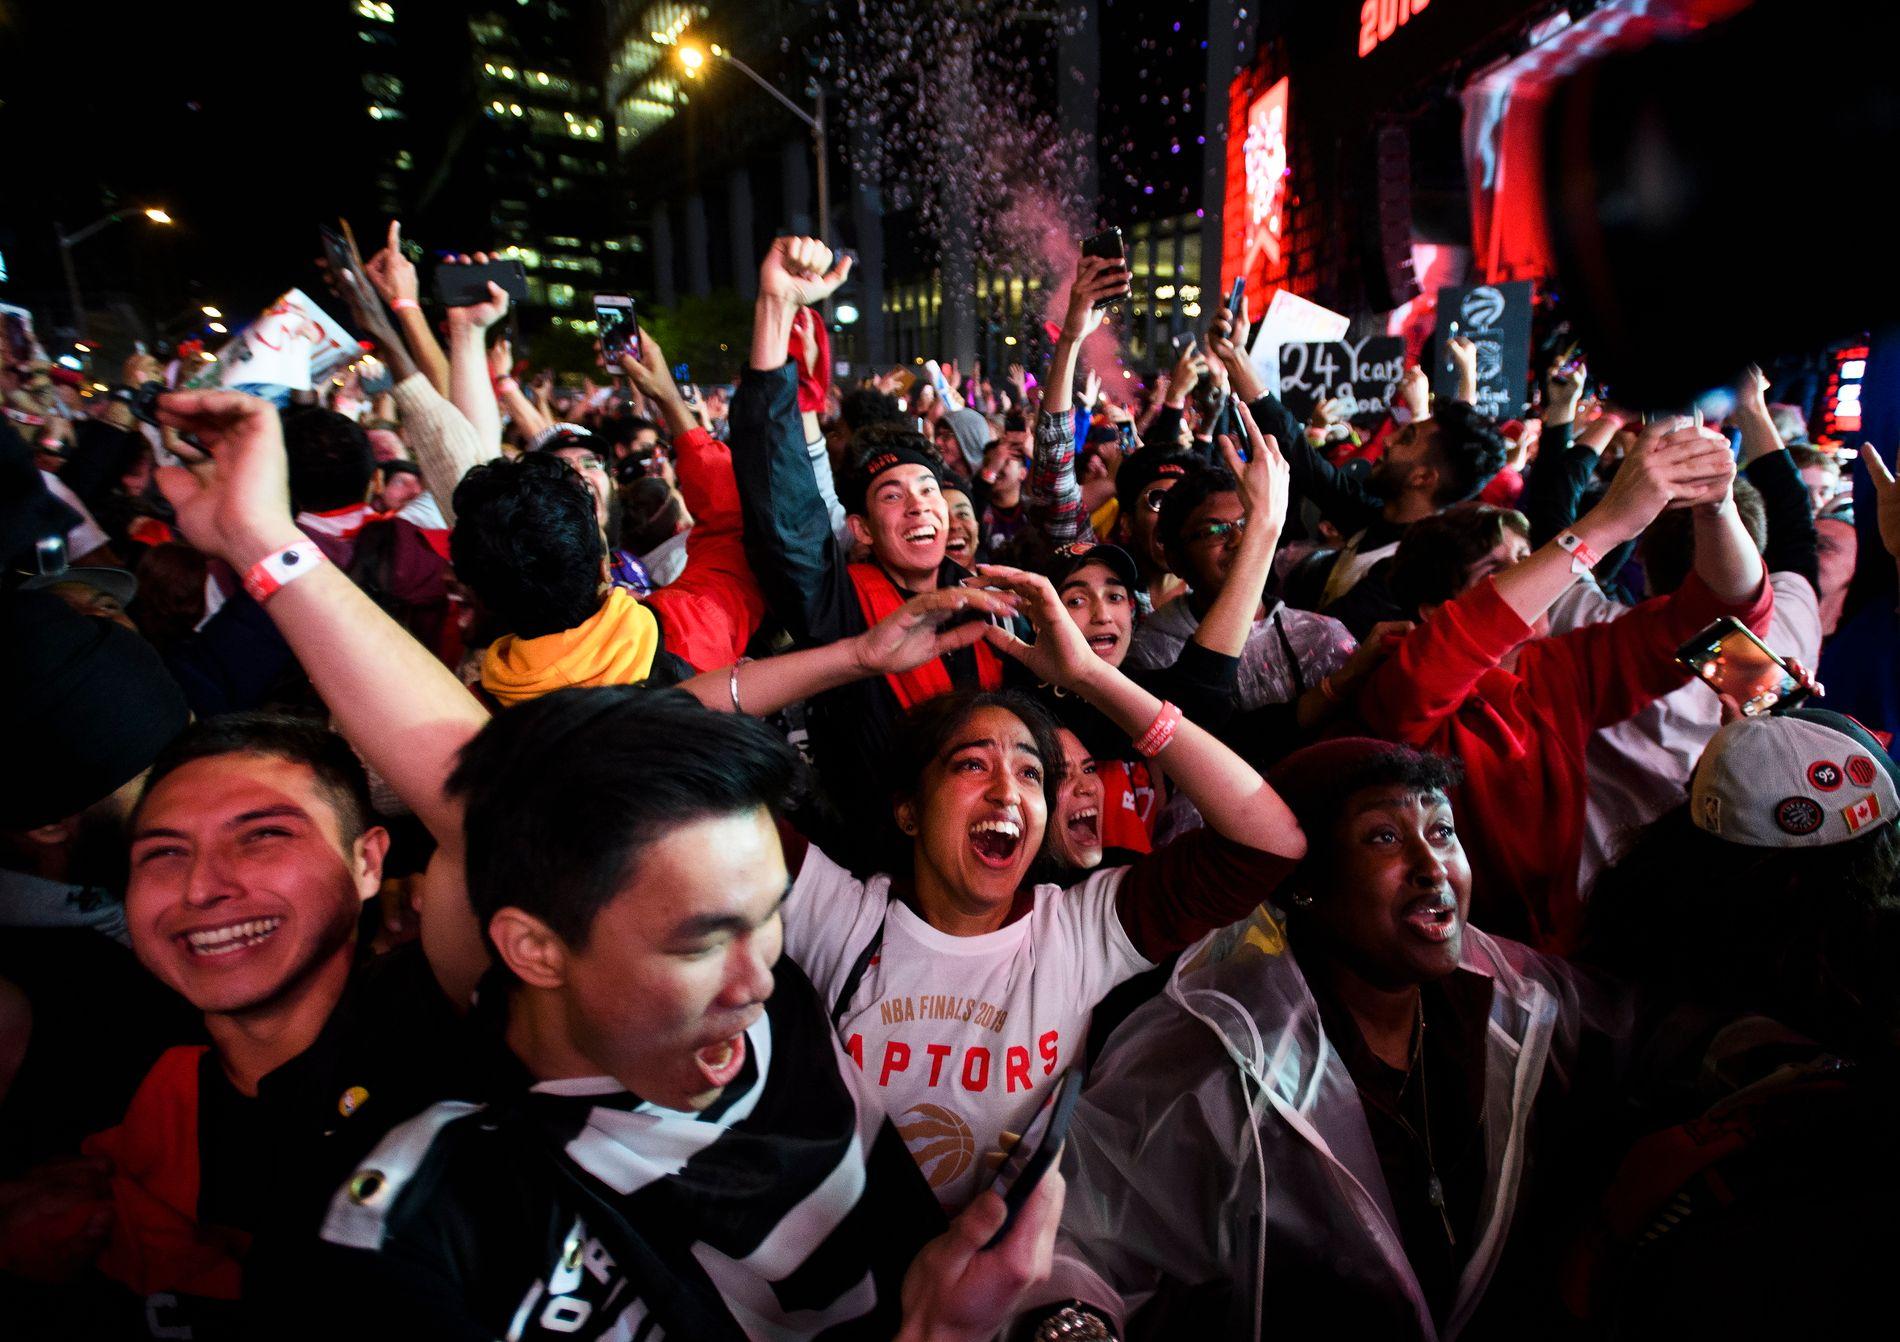 WE THE NORTH: Toronto Raptors er Canadas eneste NBA-lag. De bruker slagordet «We the north».